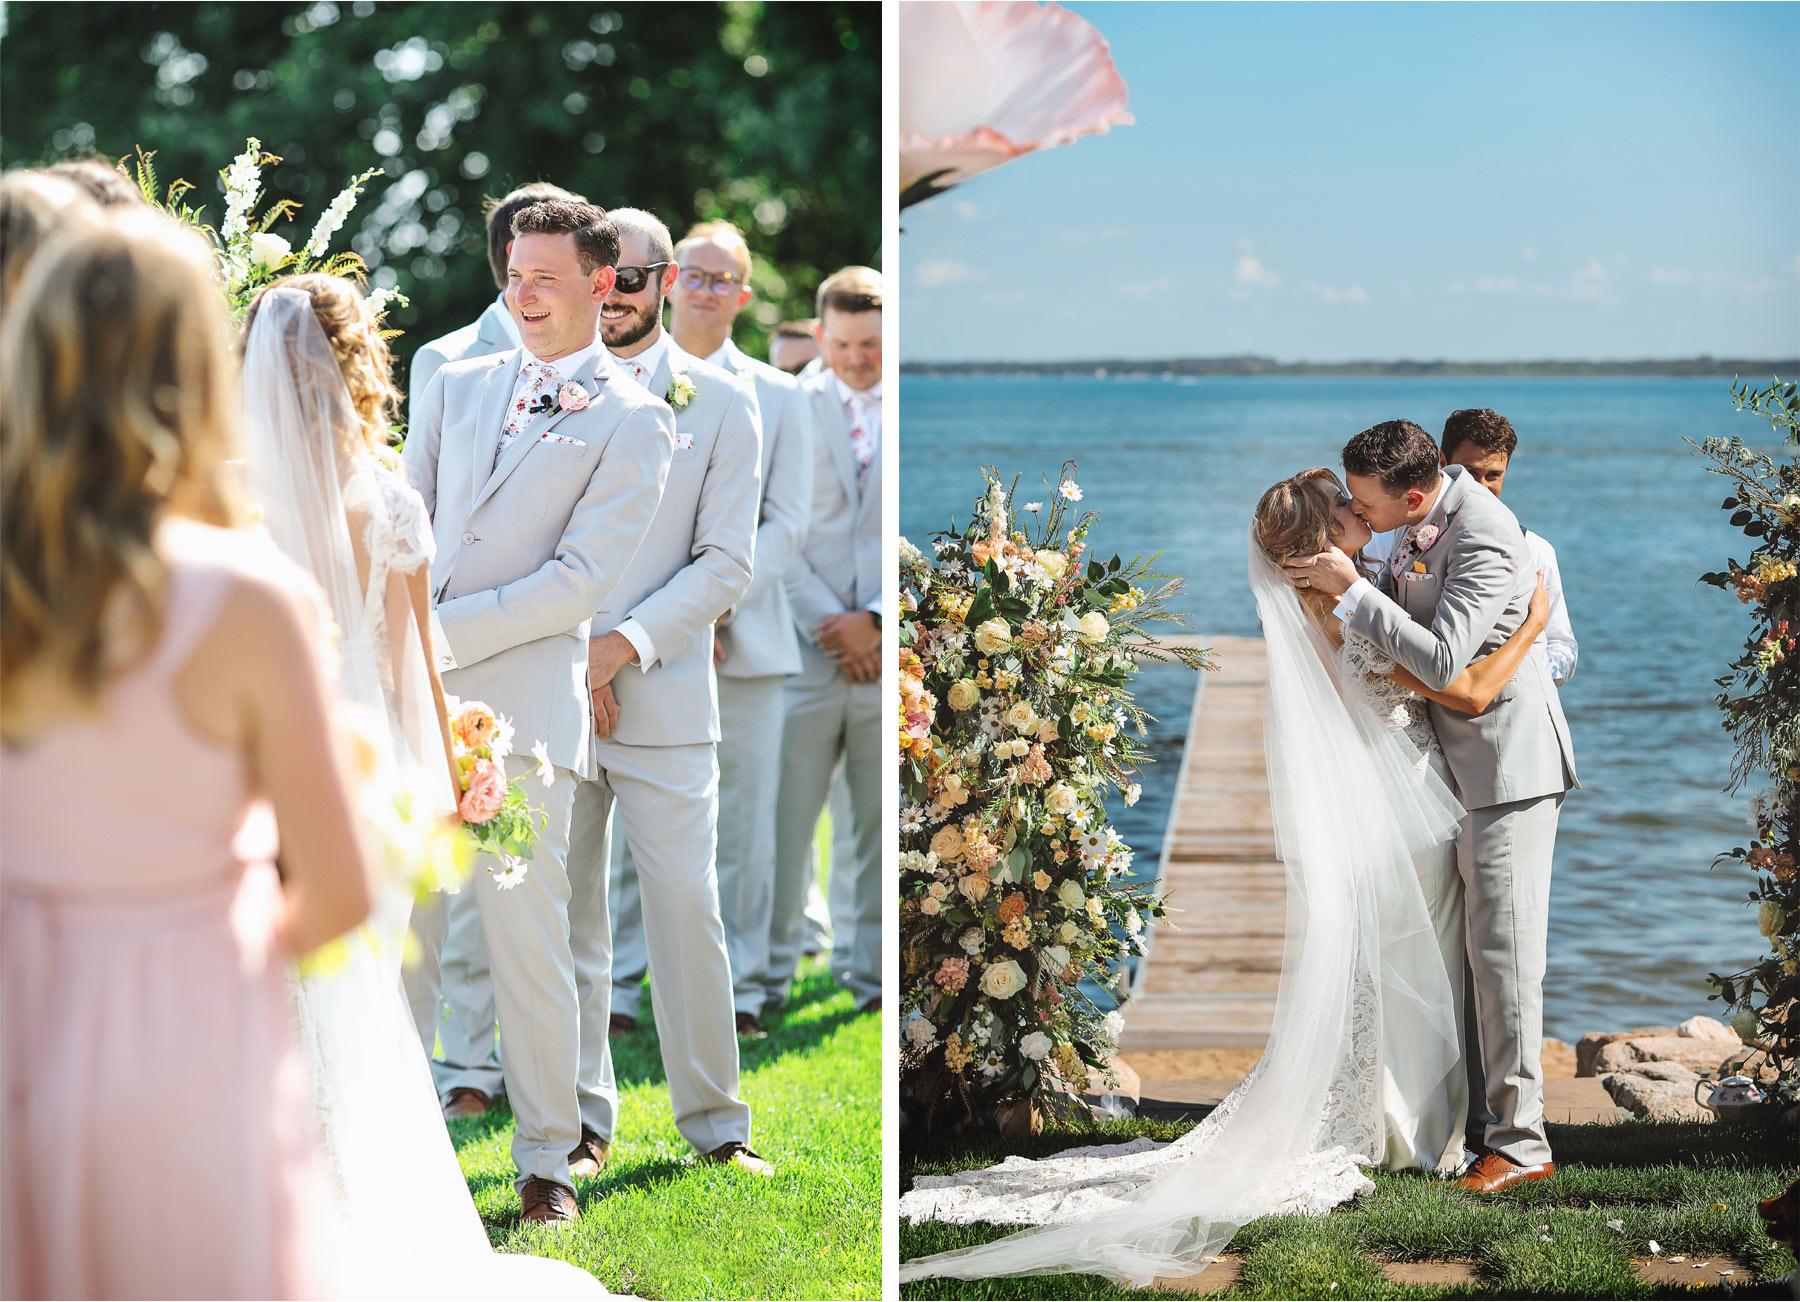 13-Vick-Photography-Wedding-Ottertail-Minnesota-Alice-in-Wonderland-Theme-Ceremony-Outdoor-Lake-Bride-Groom-Tess-and-Greg.jpg